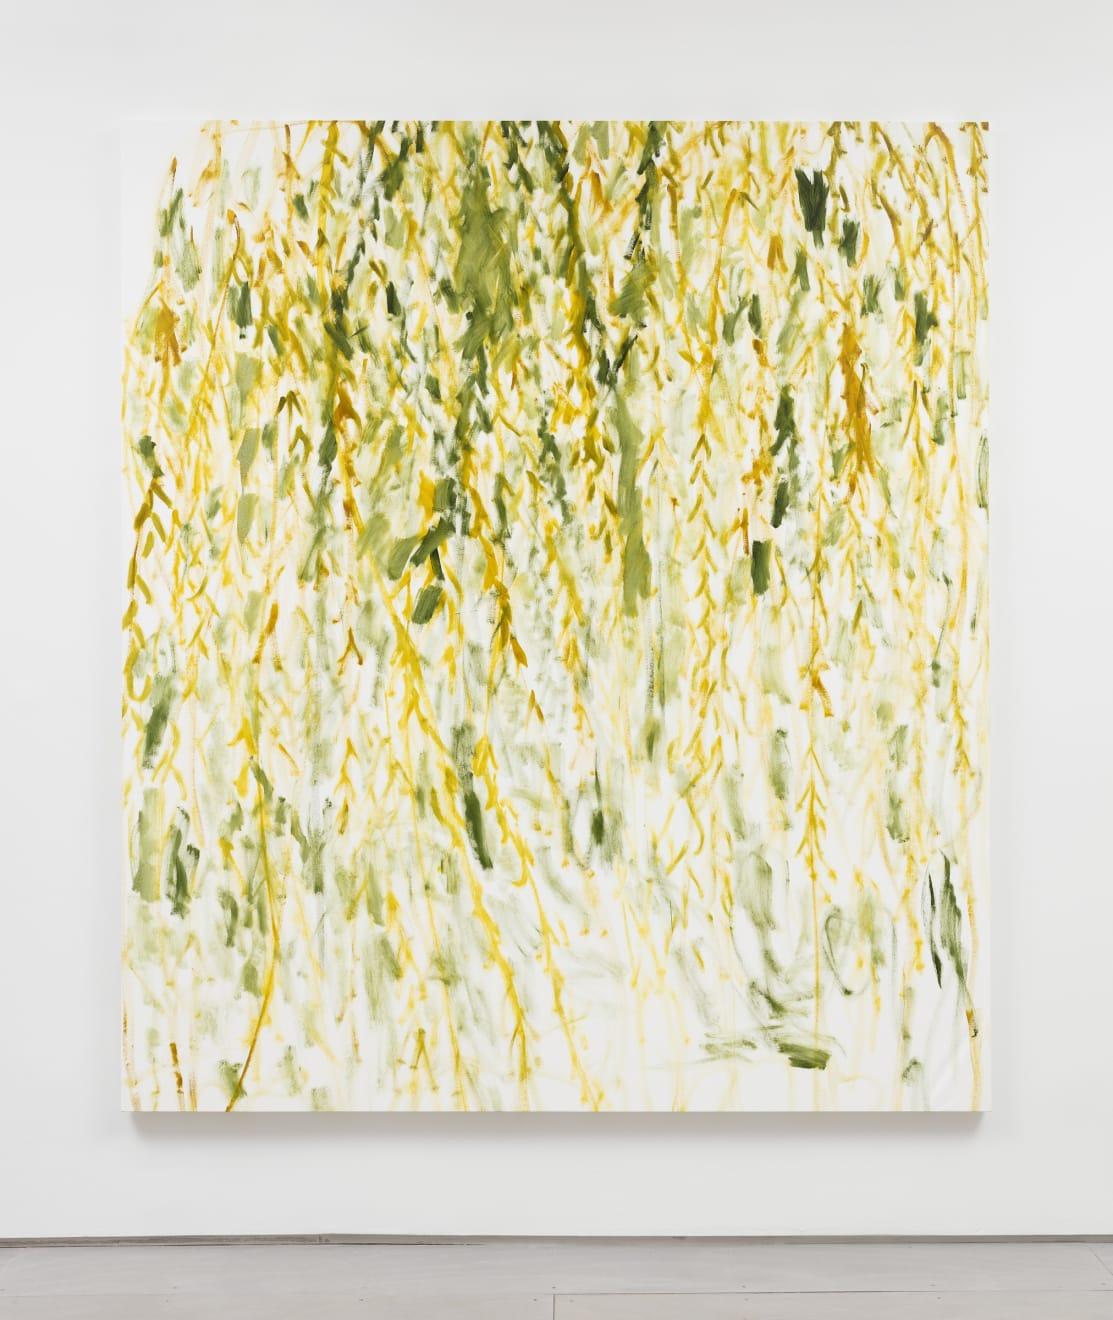 Trevor Shimizu, Weeping Willow (2), 2019